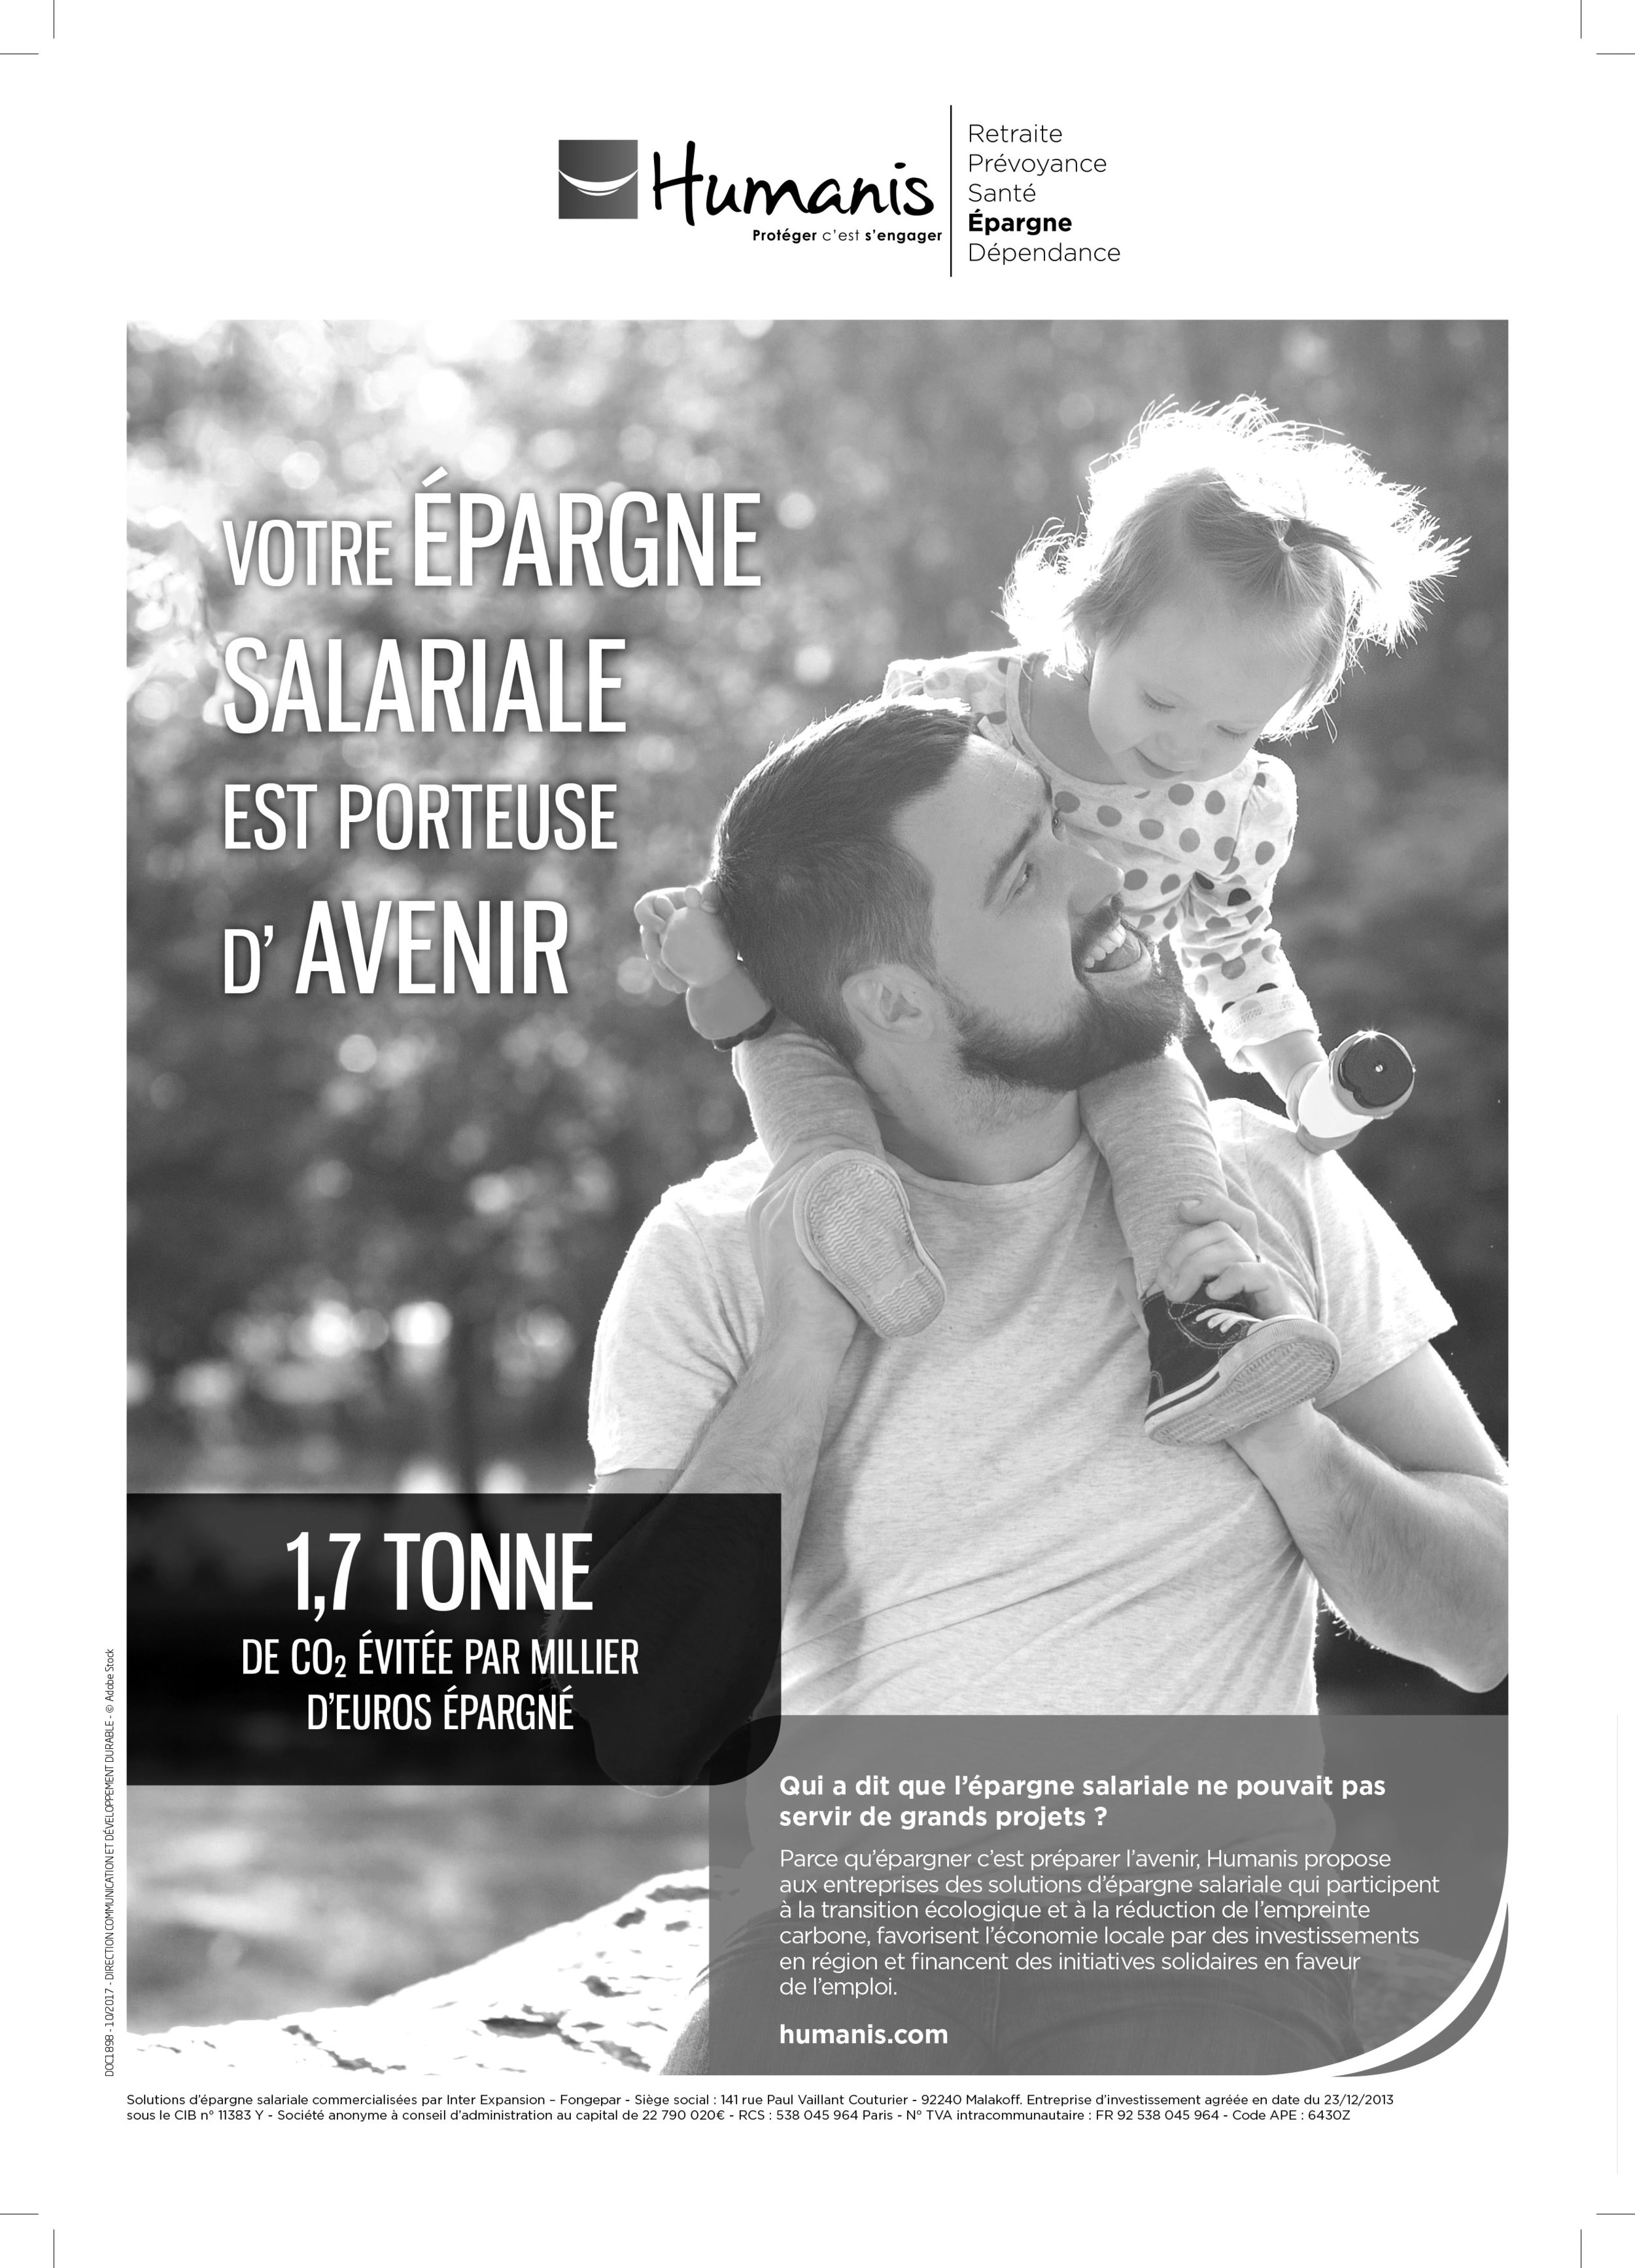 DOC1898_affiche_Epargne_epargne-salariale 210x297_10-2017-tdc-NB.jpg